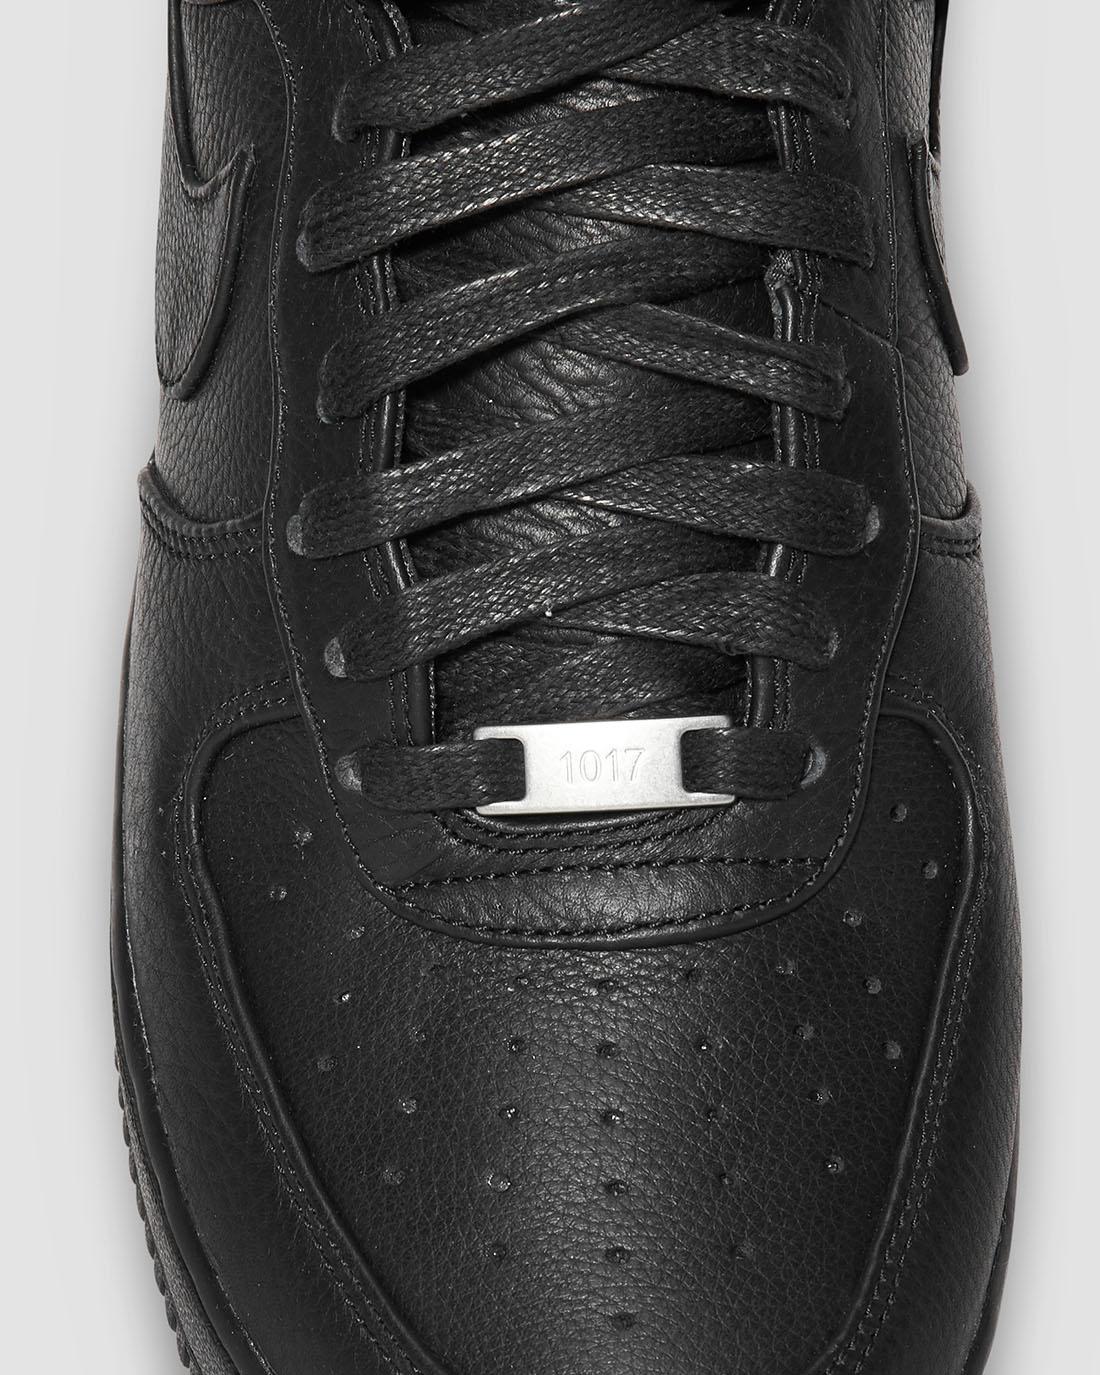 Nike Air Force 1 High x 1017 ALYX 9SM